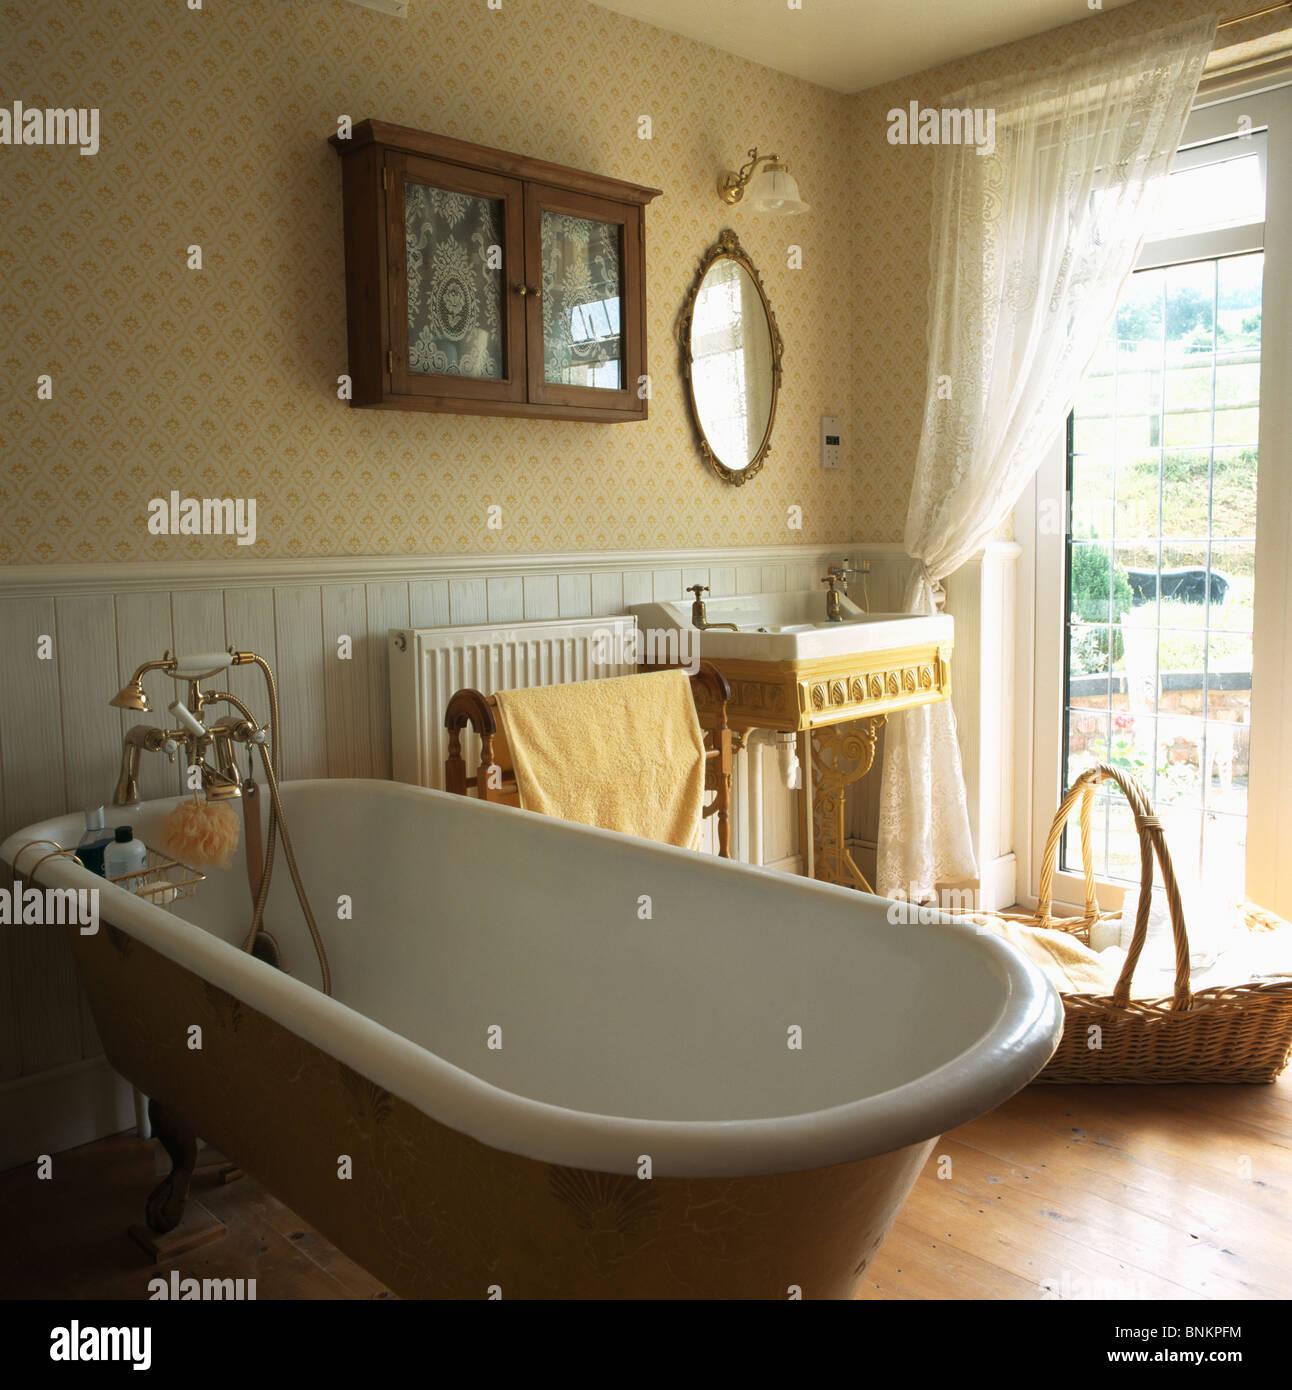 popular wallpaper for bathrooms - photo #40